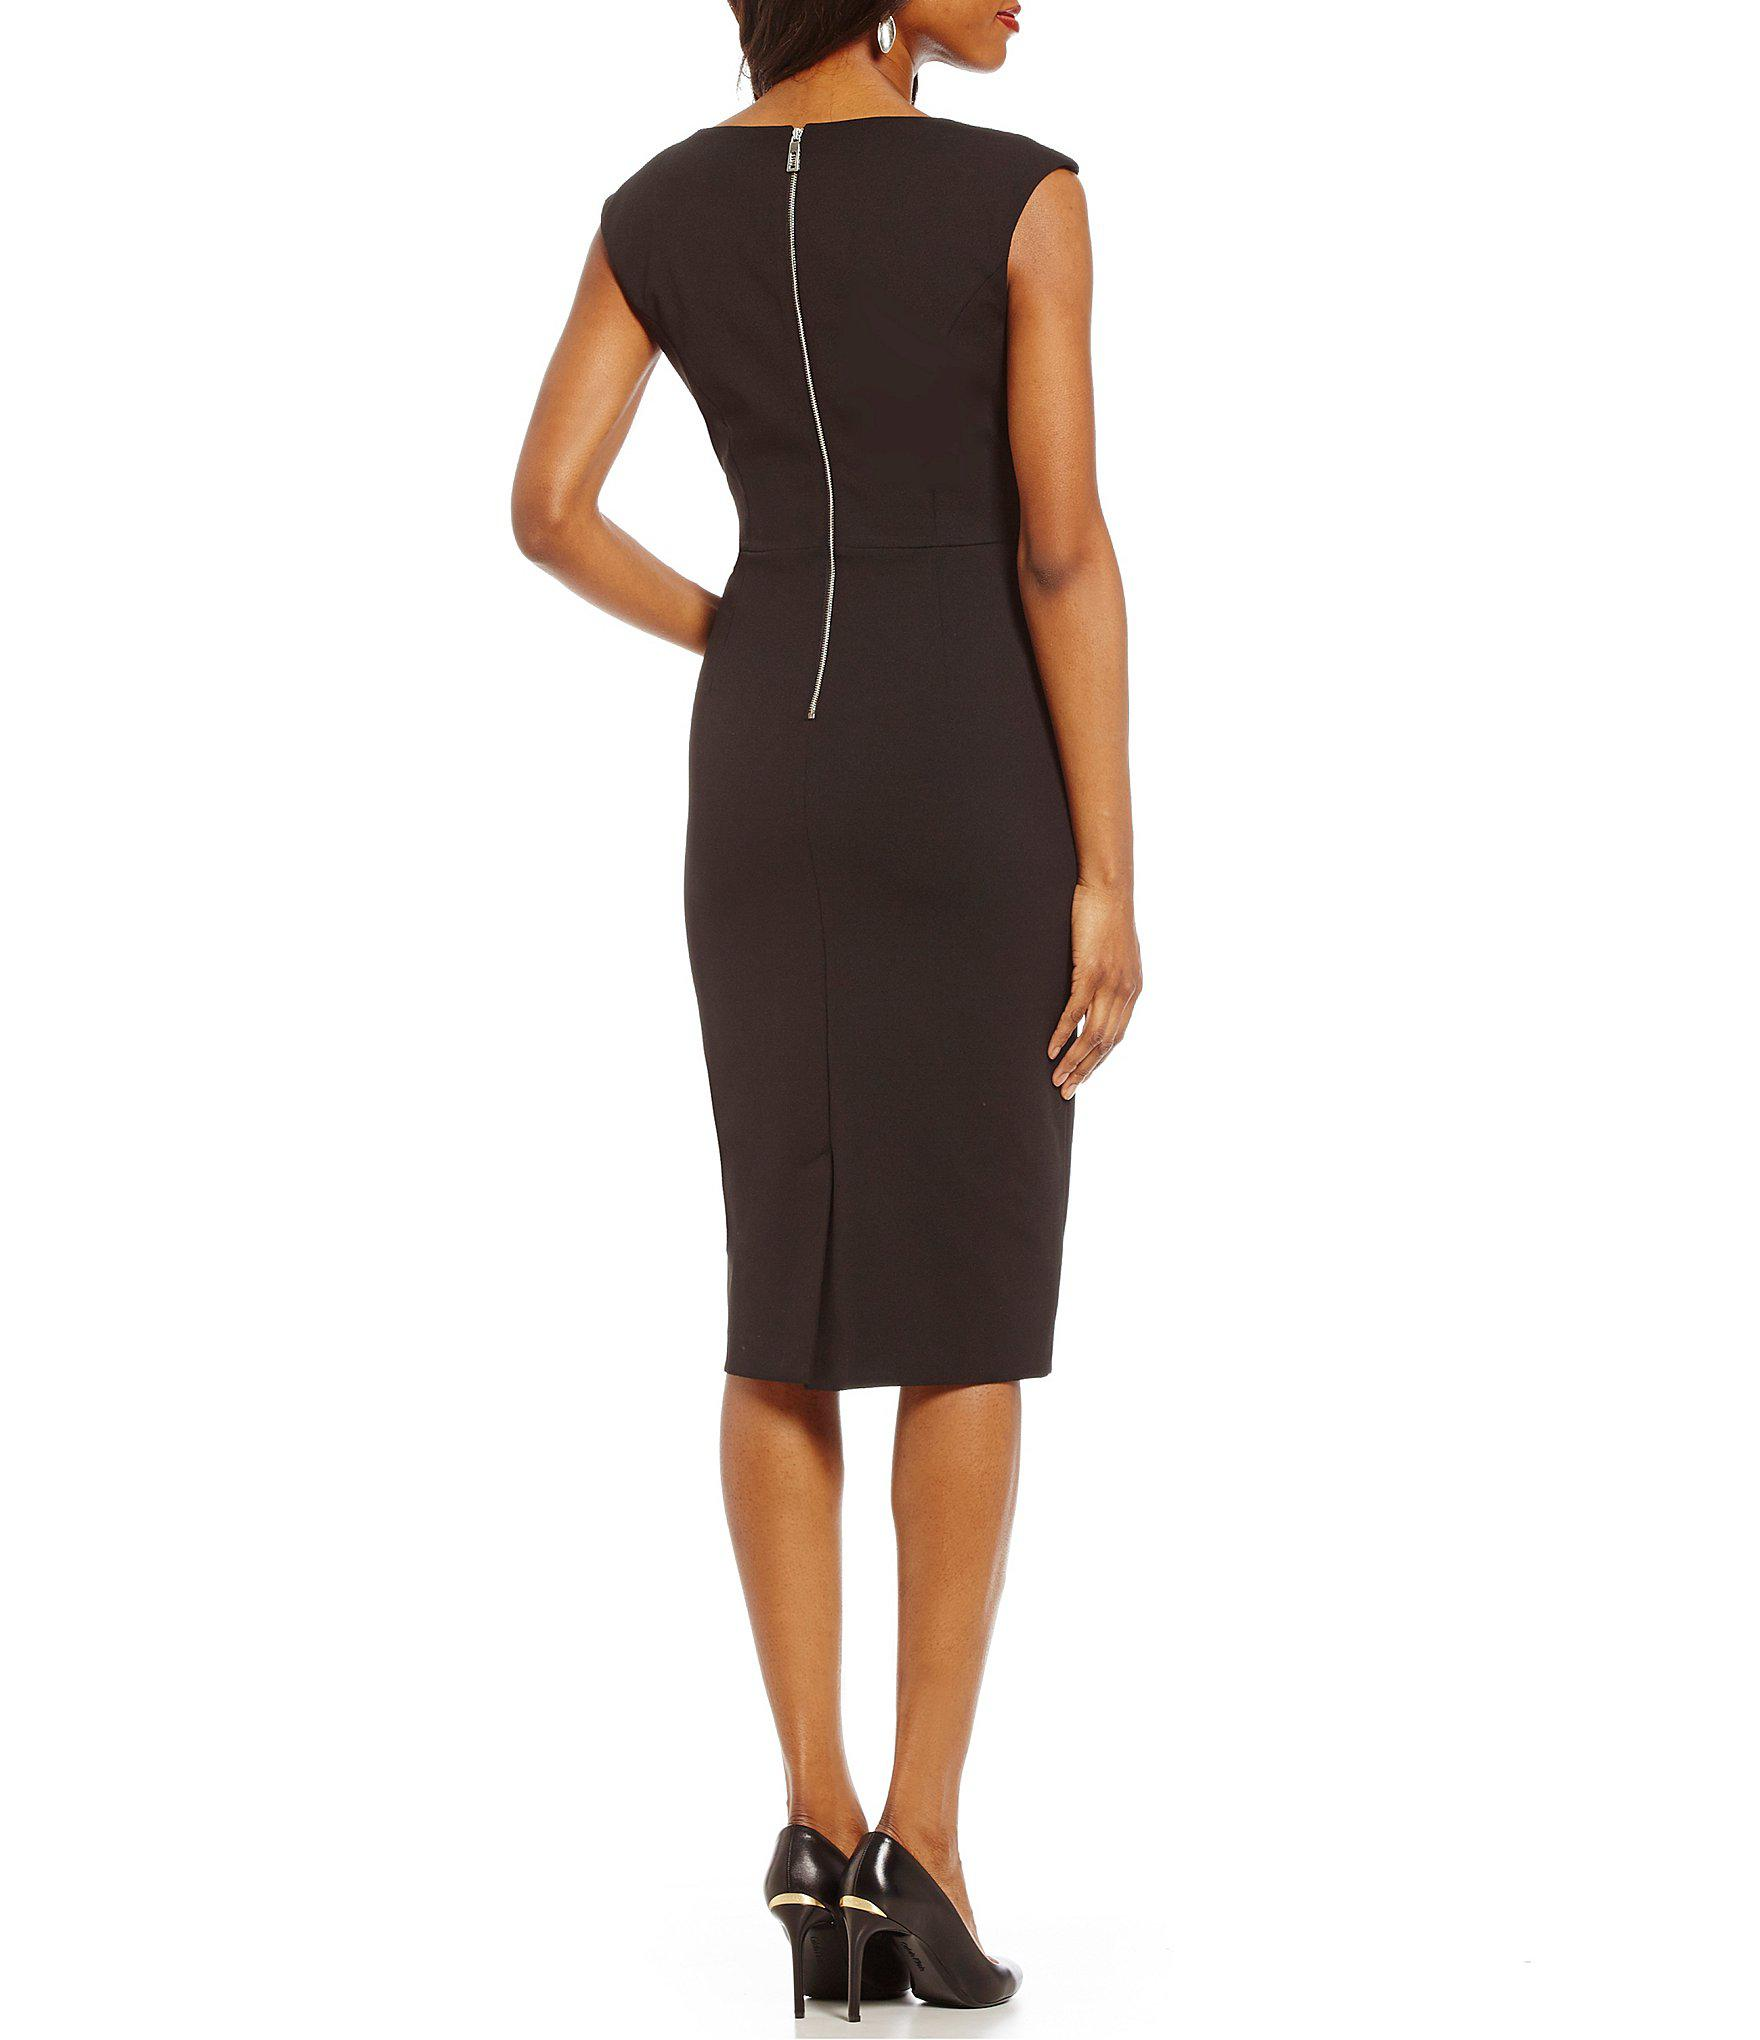 889e082af3f Ivanka Trump - Black Compression Panel Scuba Crepe Sheath Dress - Lyst.  View fullscreen